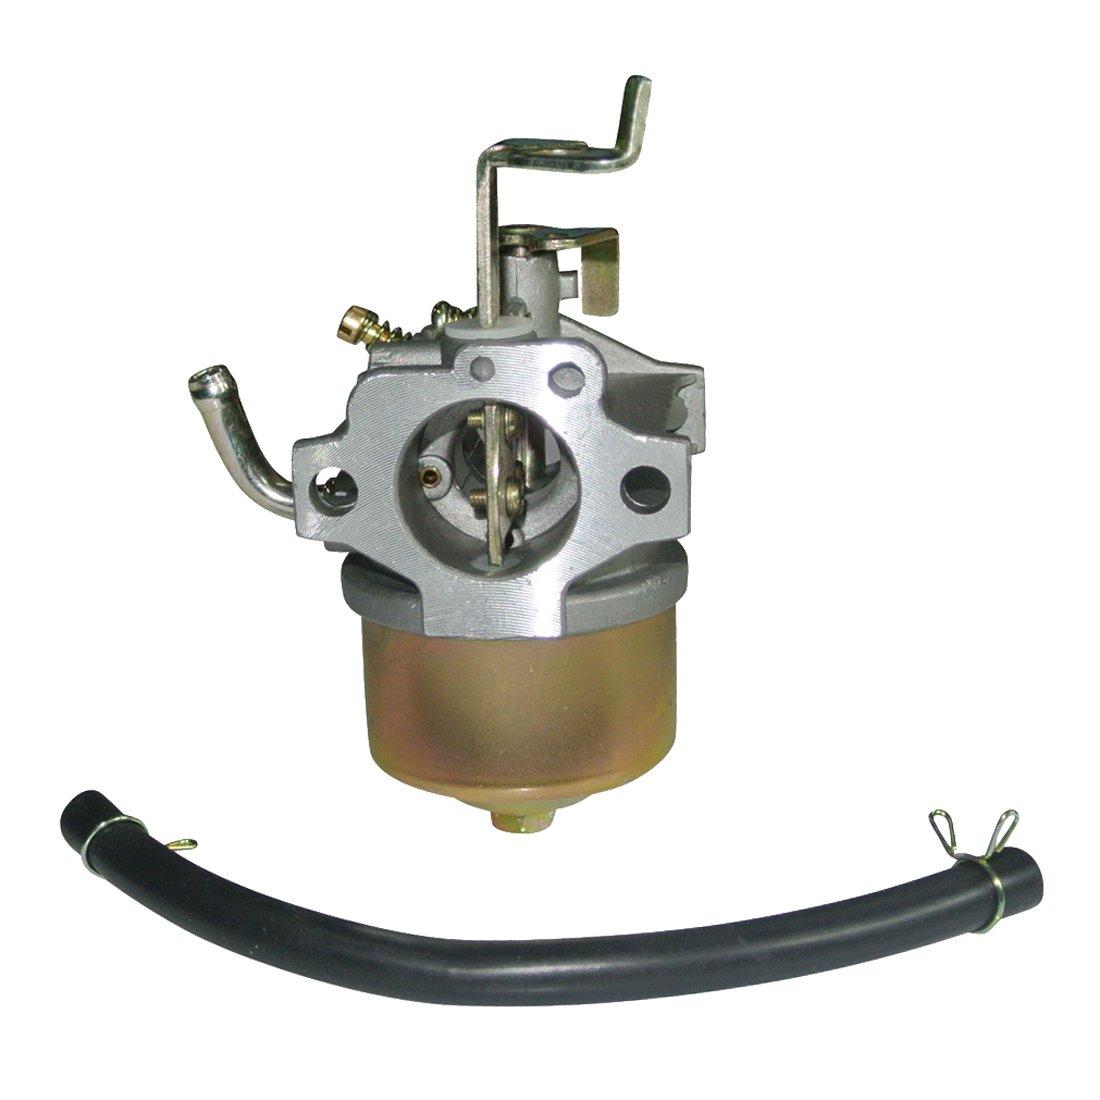 New Generic Carburettor Carburetor Fits Robin Wisconsin Subaru EY20 EY15 WI-185 Generator by JL JIANGLI LEGEND